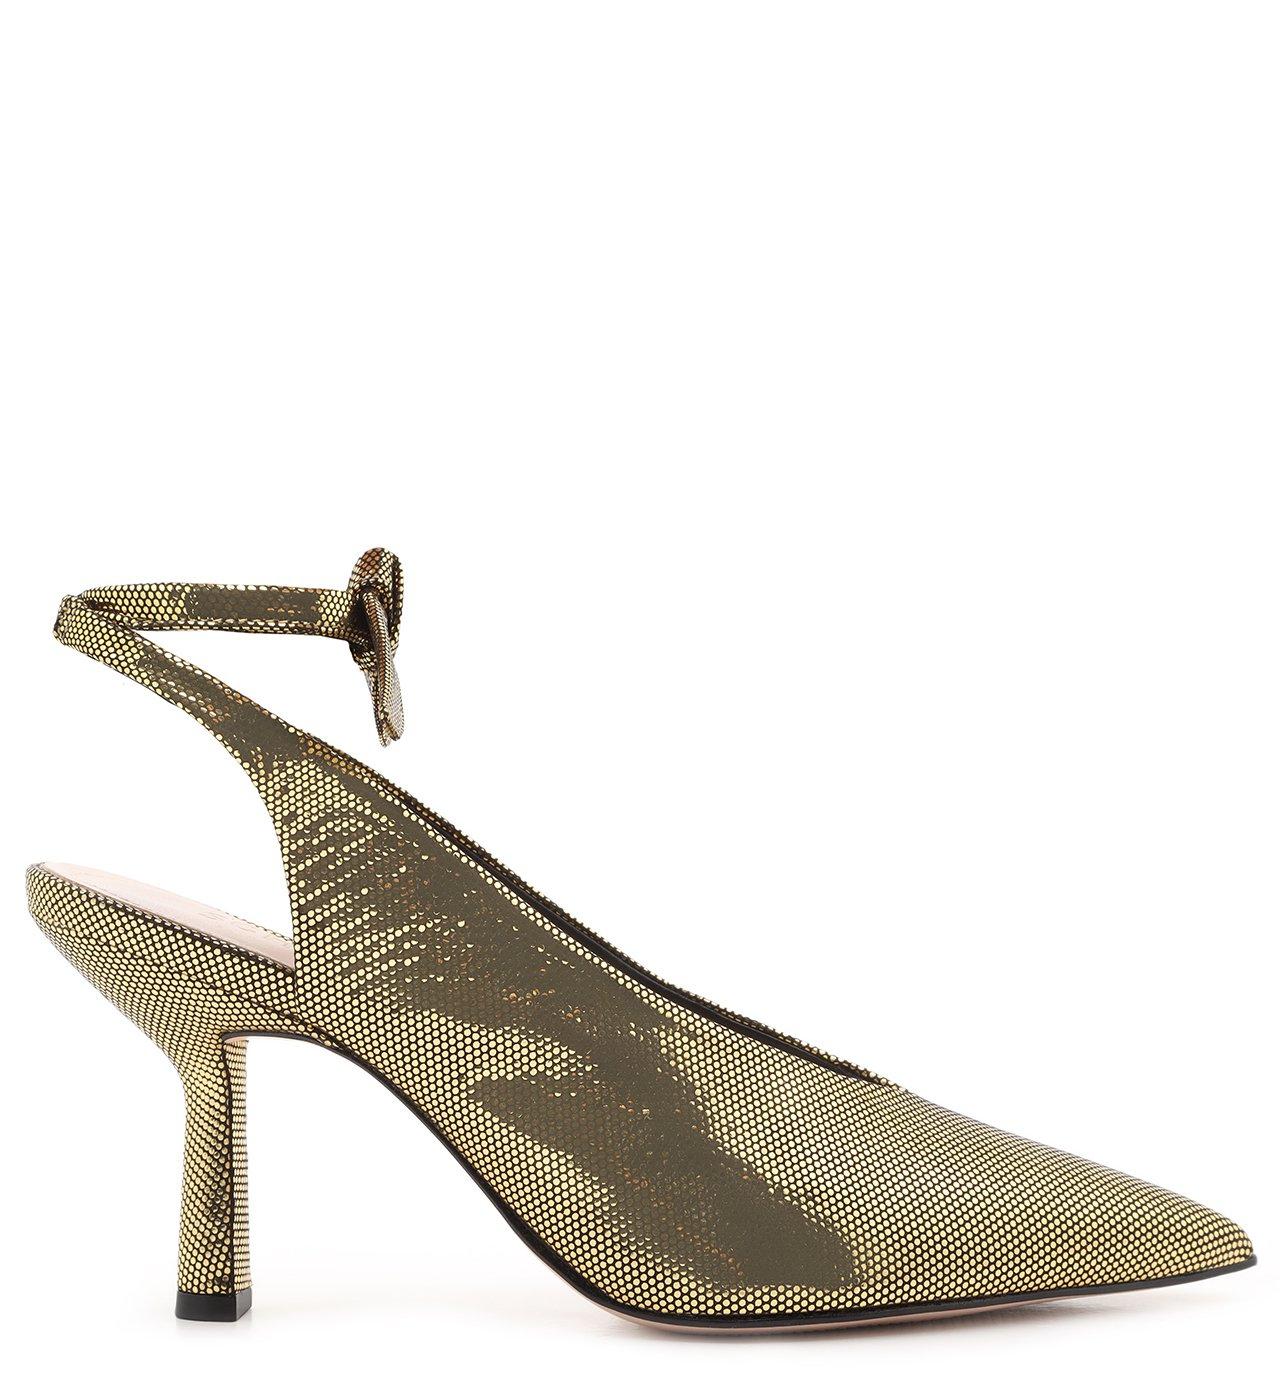 Scarpin Lace-Up Metallic Gold | Schutz